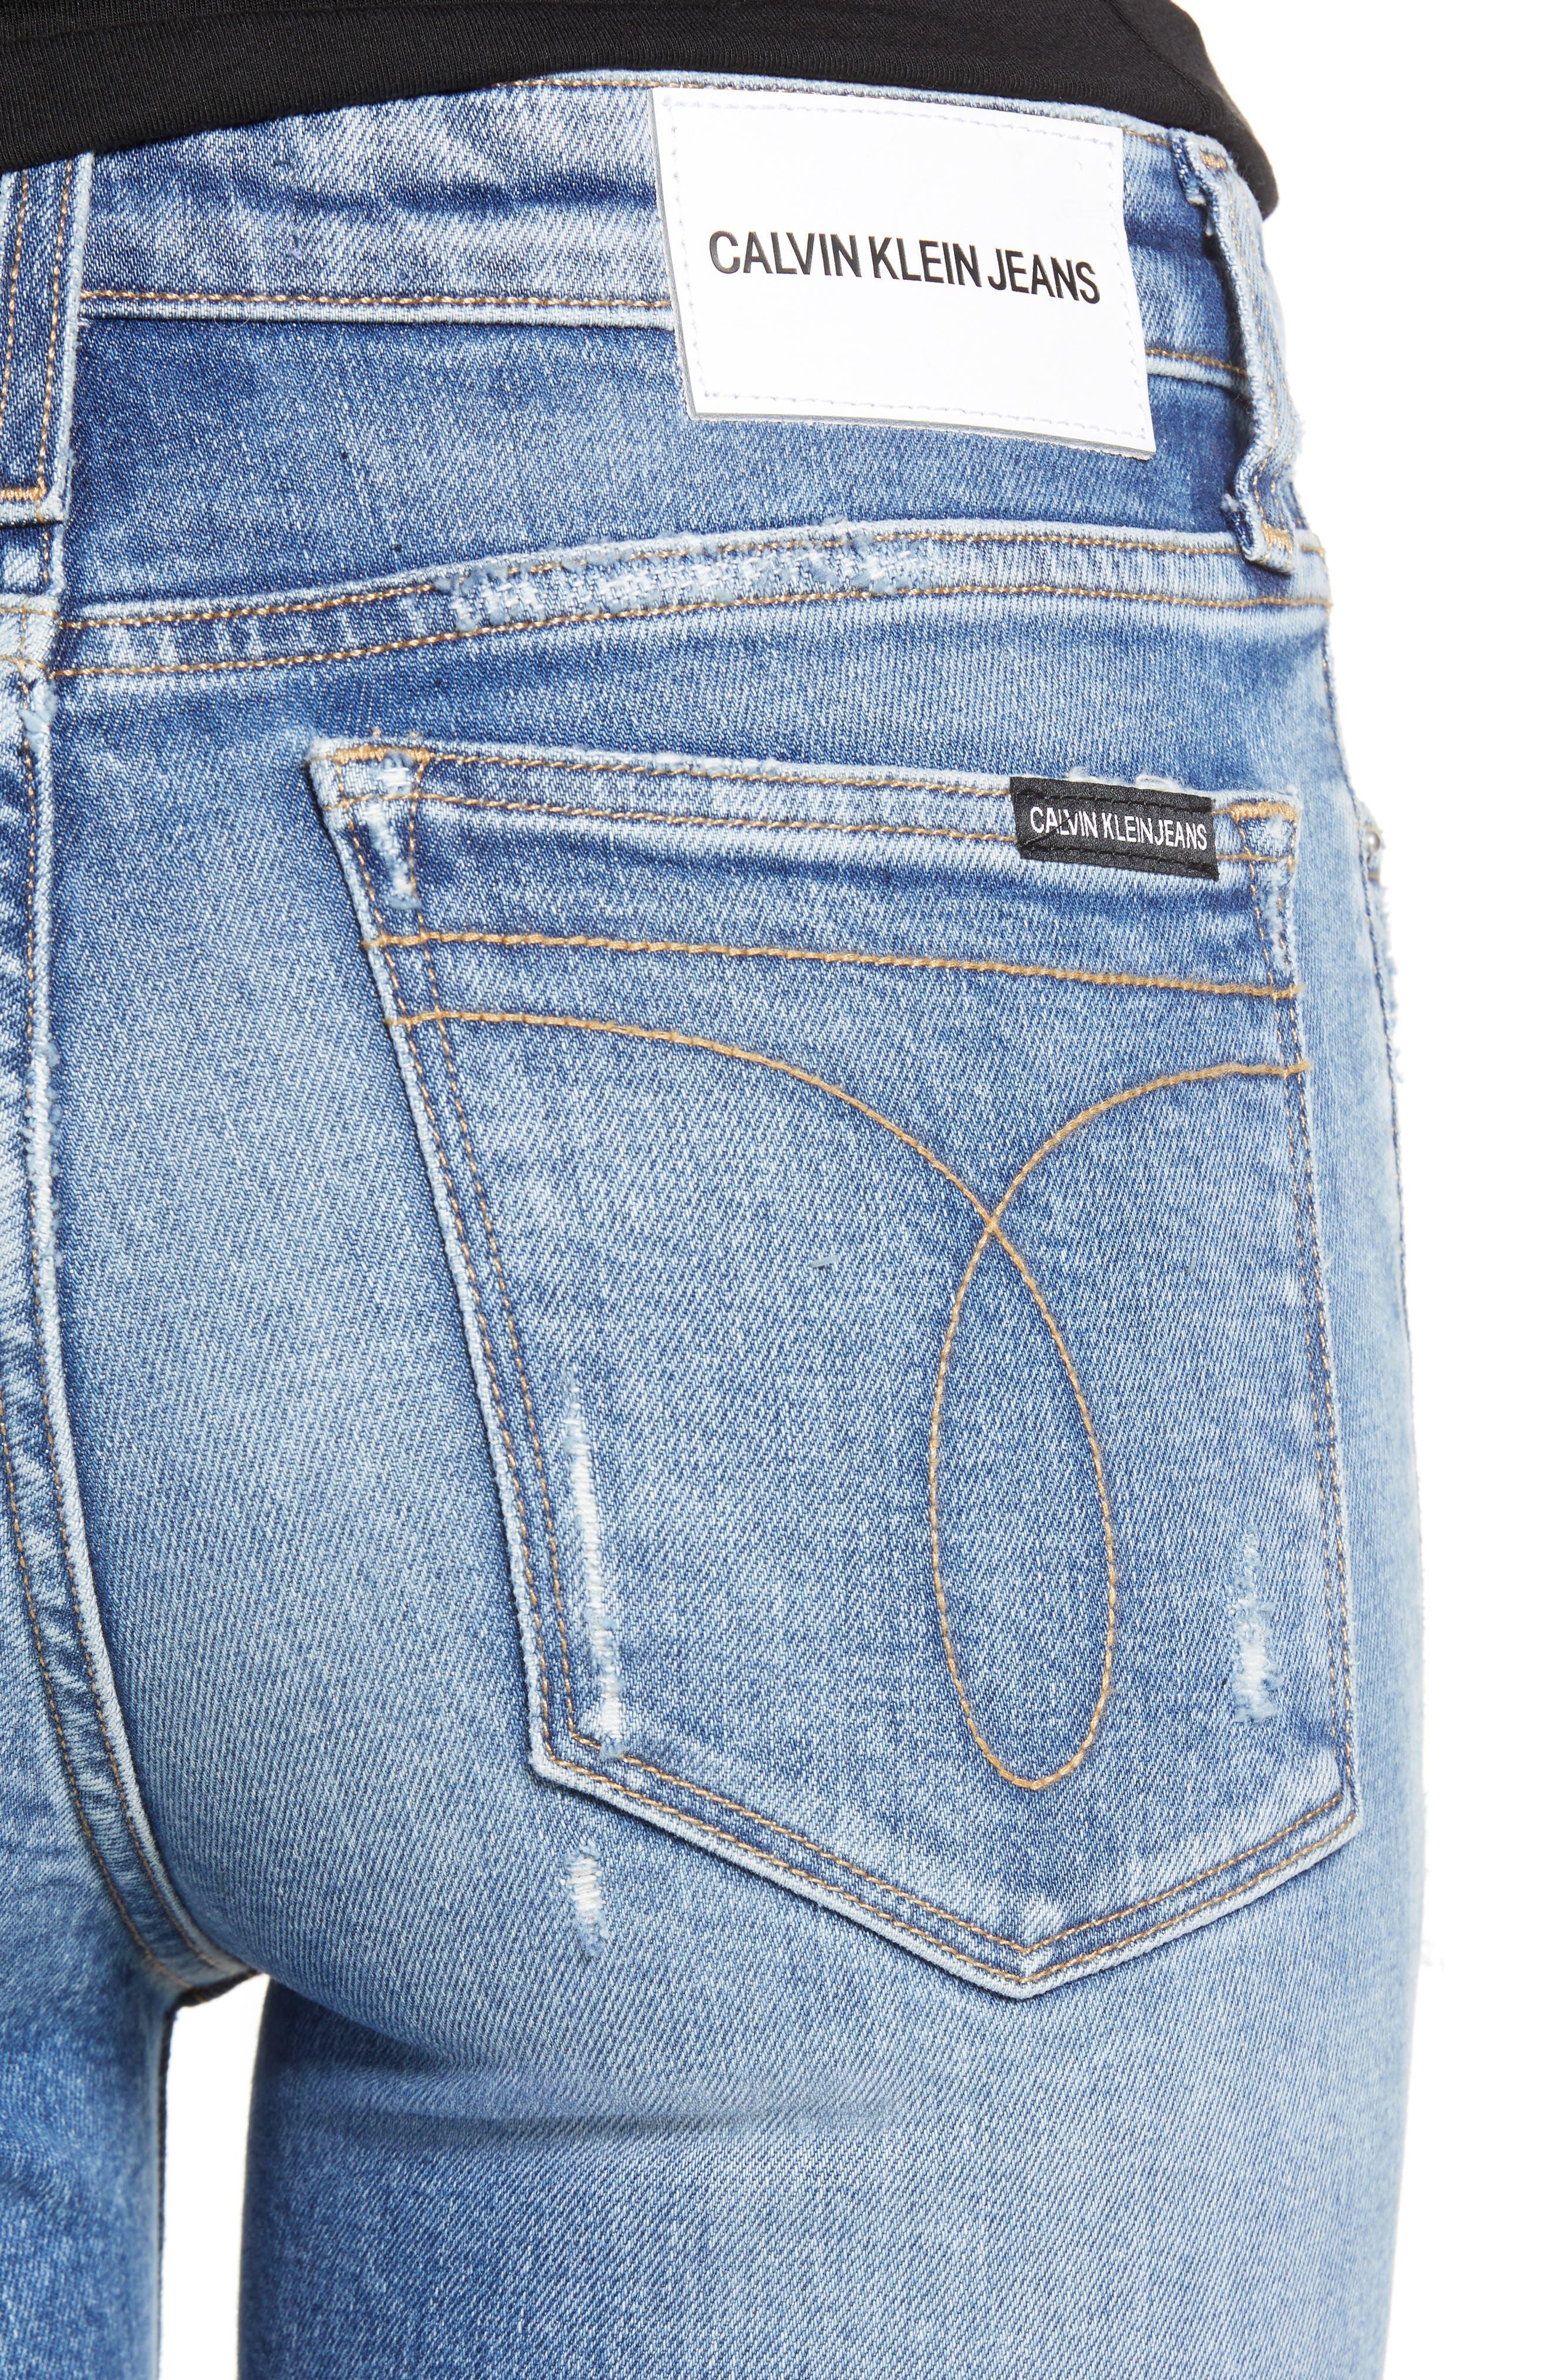 Ankle Skinny Jeans,                             Alternate thumbnail 4, color,                             FORESTER BLUE